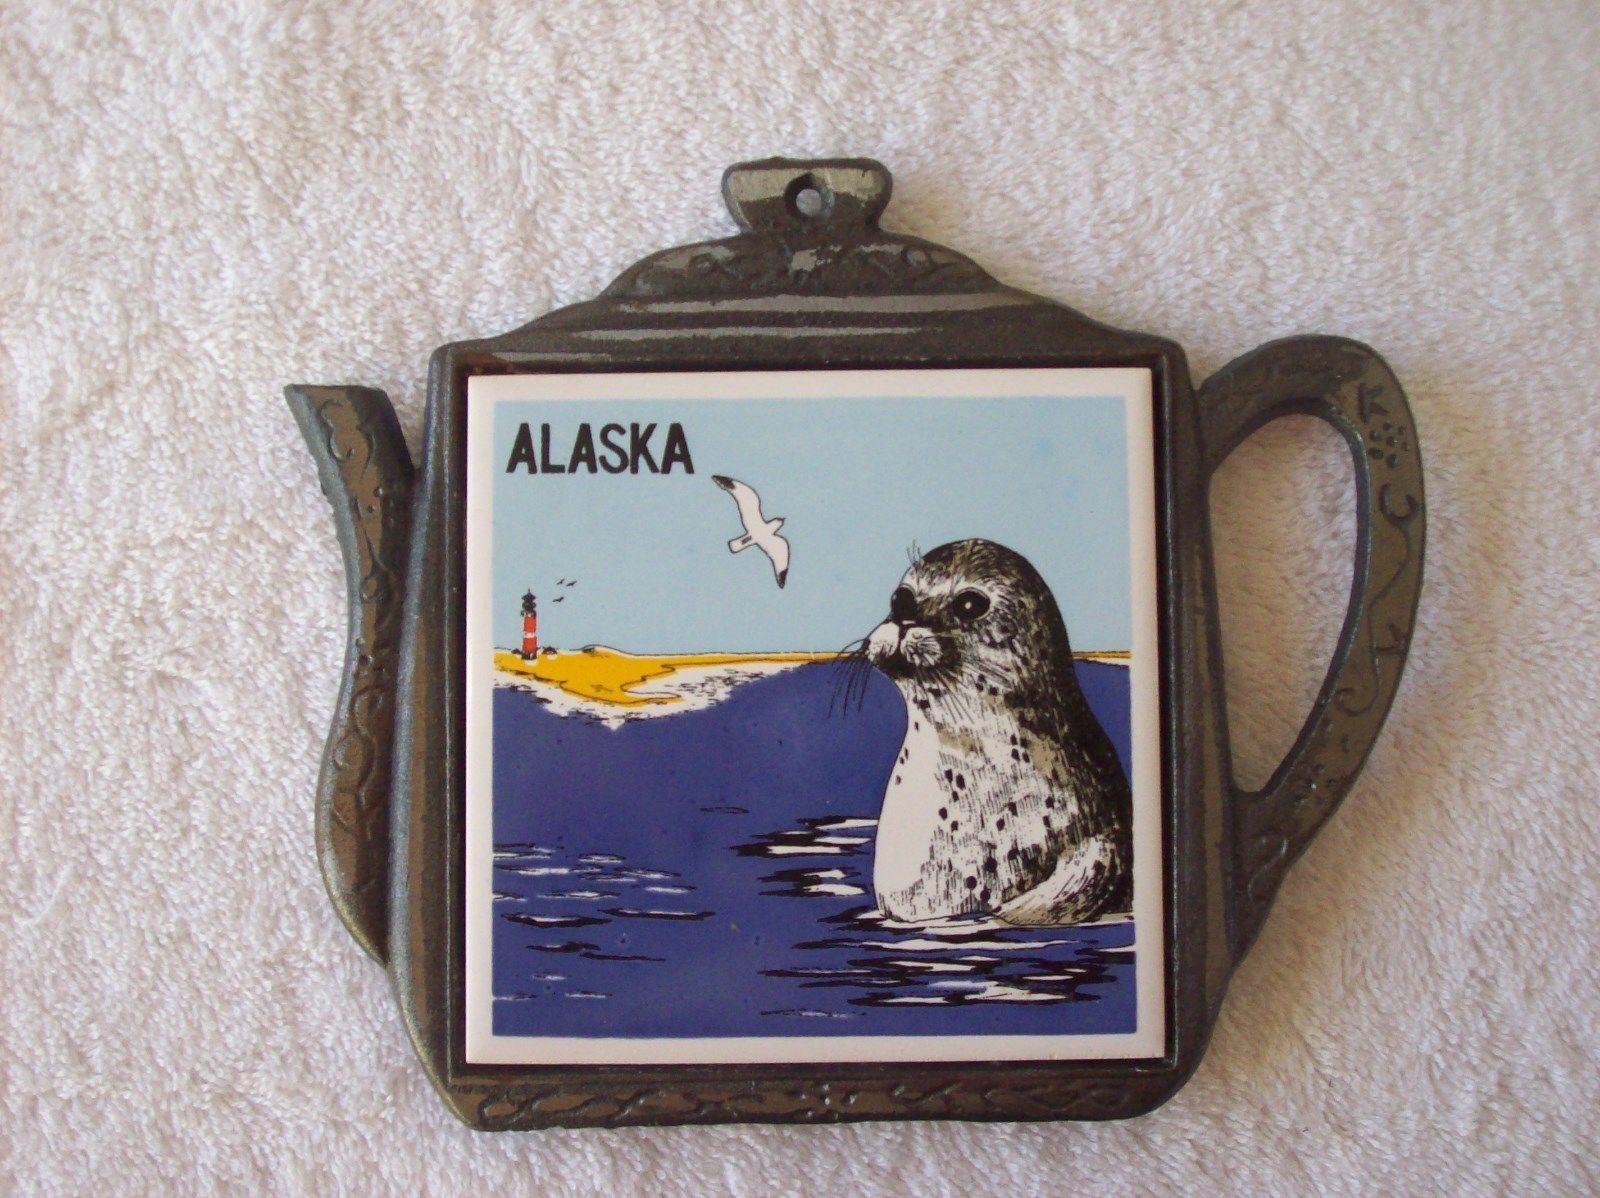 Cast iron kitchen trivet tea pot stand metal hot dish tray cookware - Vintage Cast Iron Teapot Shaped Trivet W Alaska Ceramic Tile Ebay